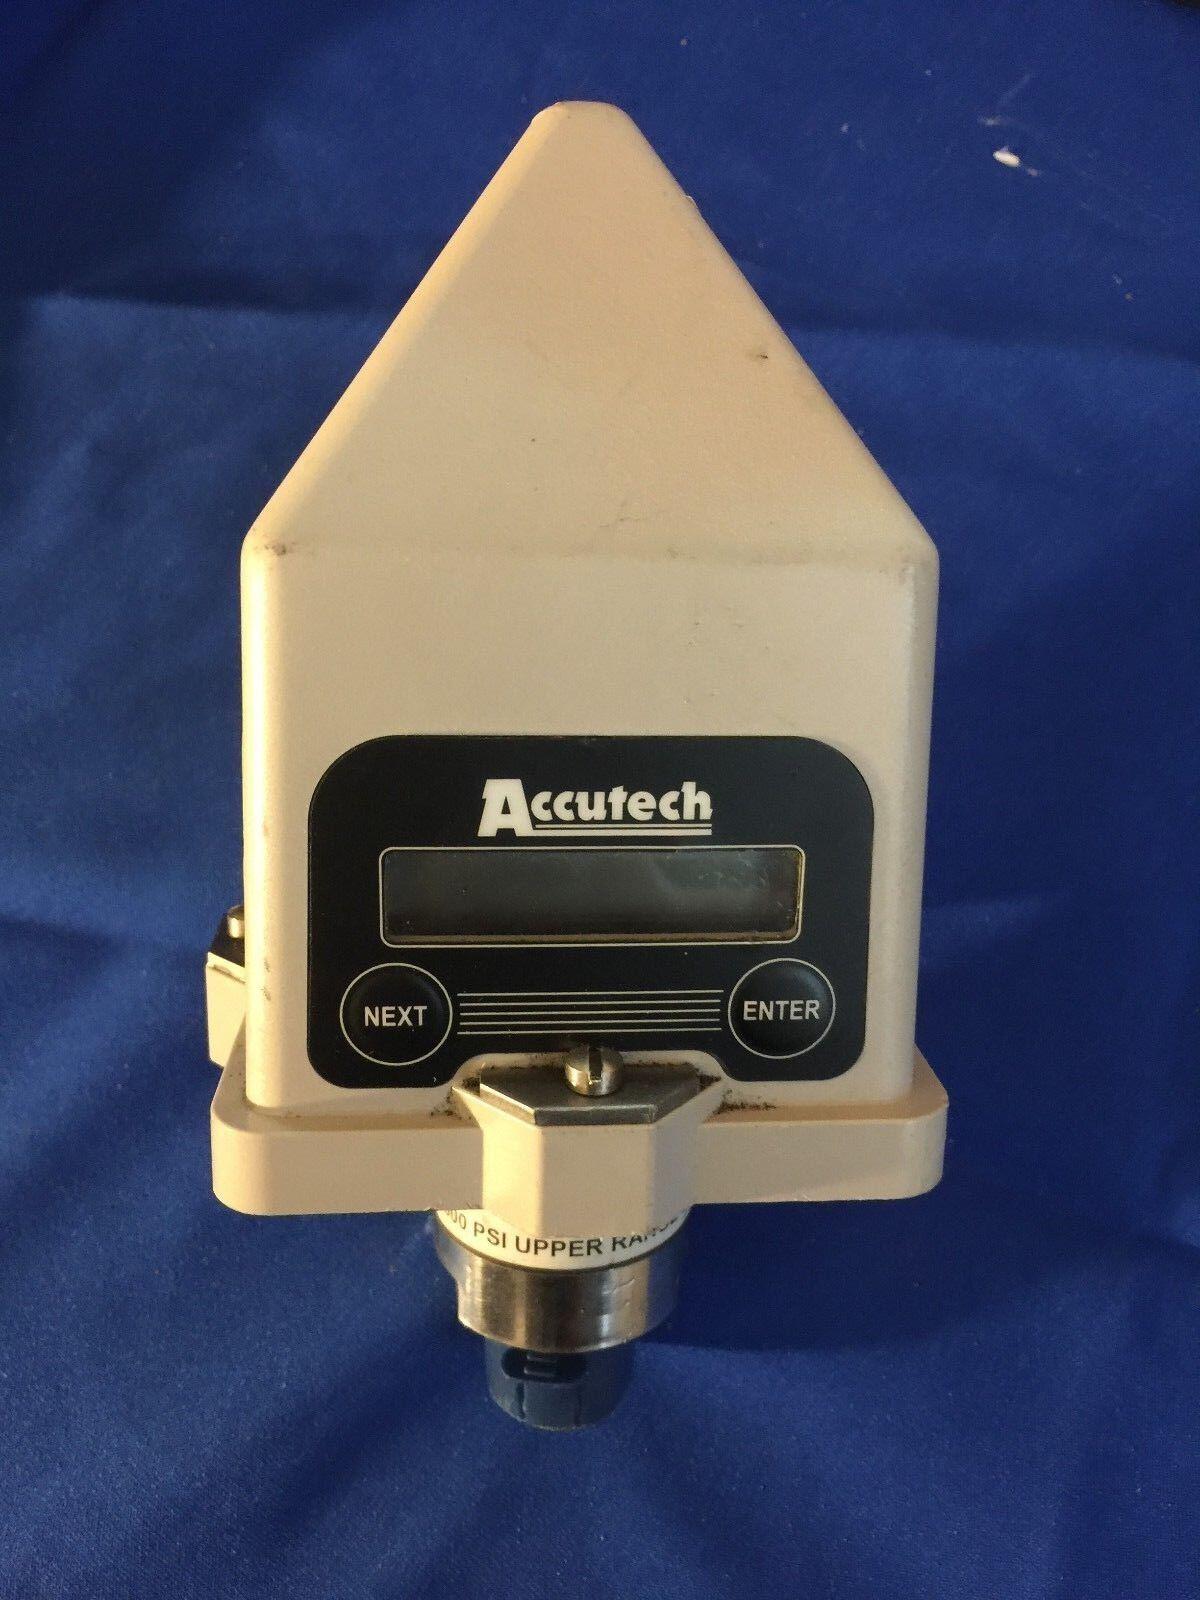 Accutech WI-GP-I-1000 1000 PSI Upper Range Limit